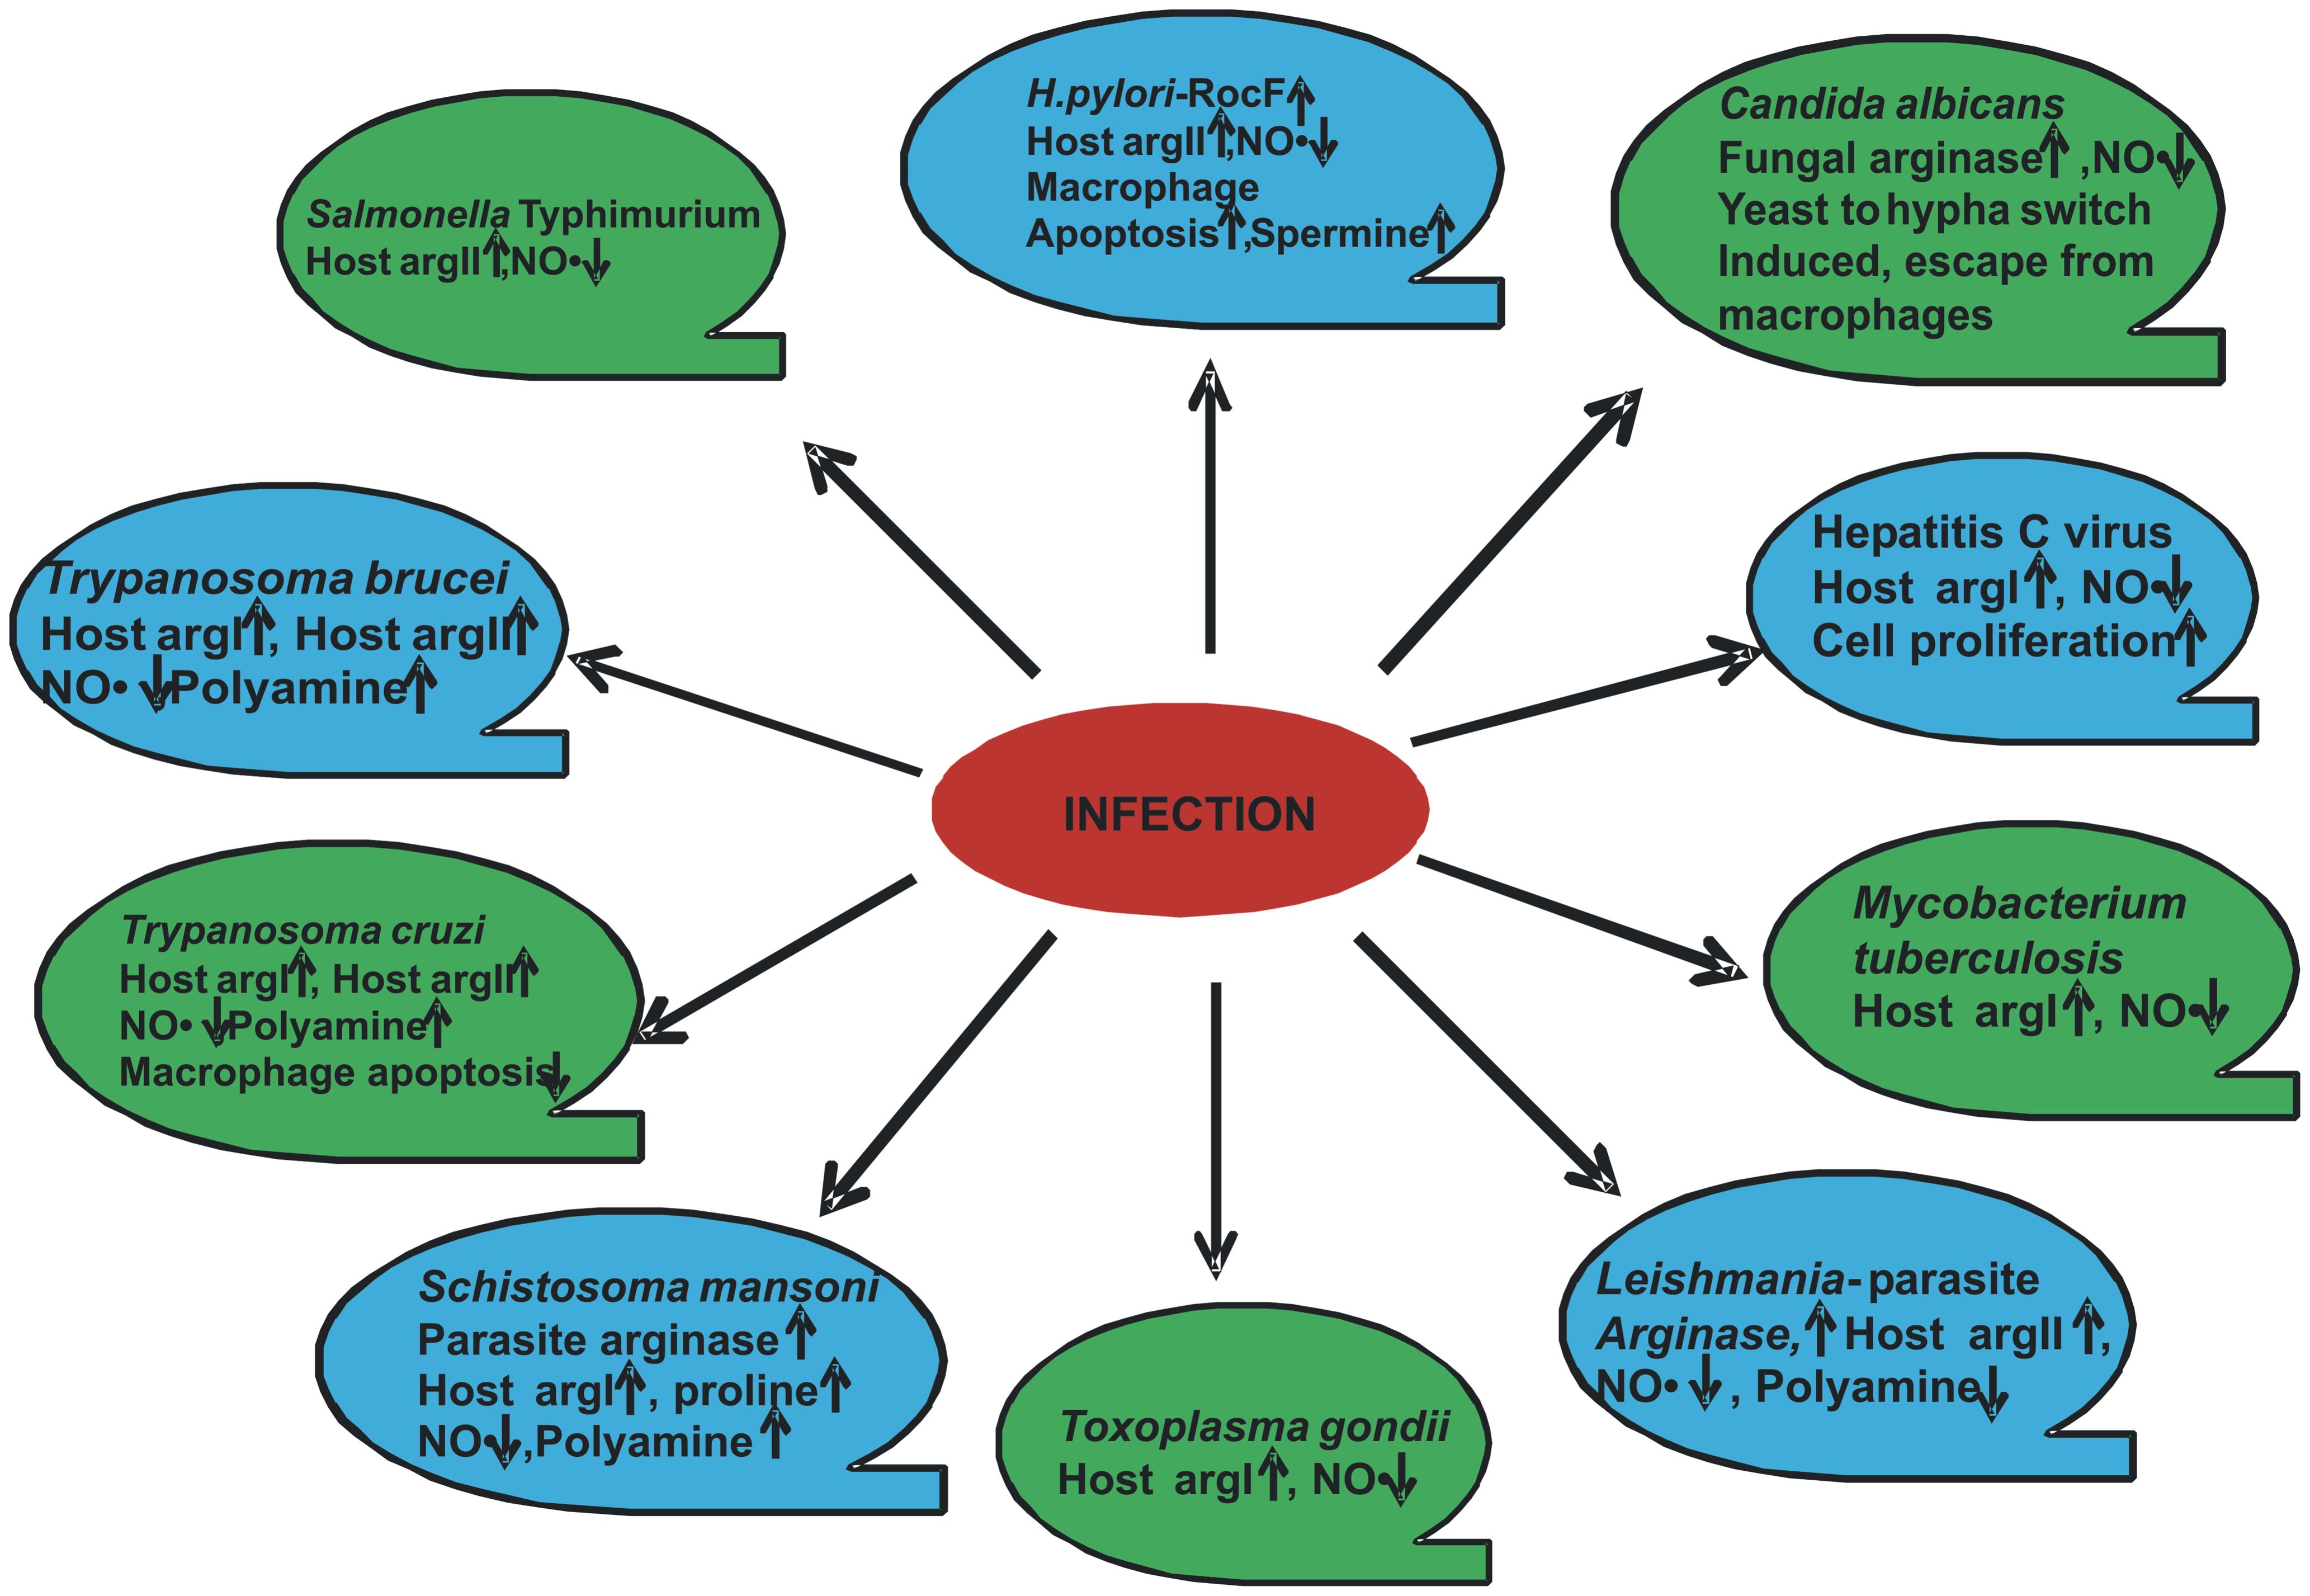 Modulation of arginase by various pathogens.